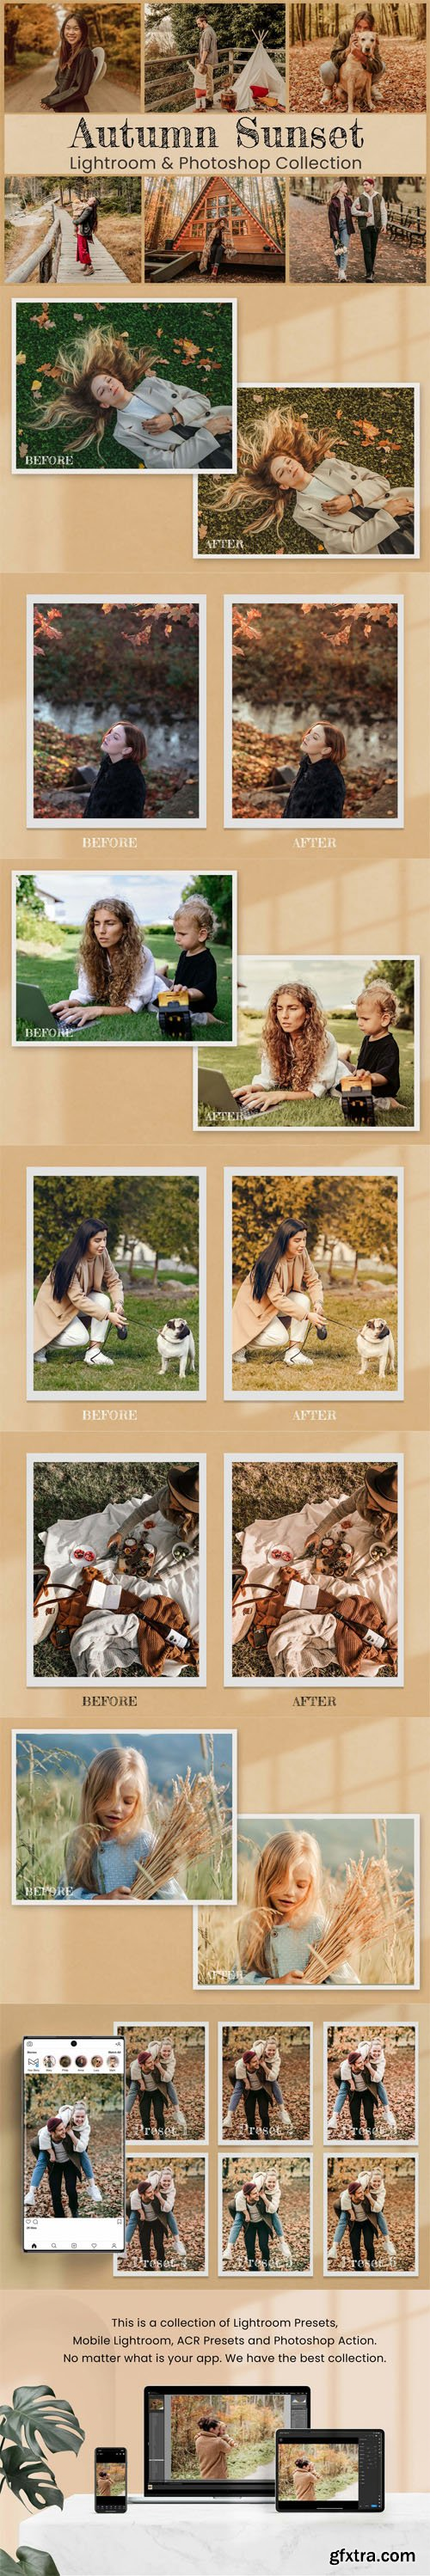 Autumn Sunset Photography Lightroom & Photoshop Presets Collection [Mobile & Desktop]